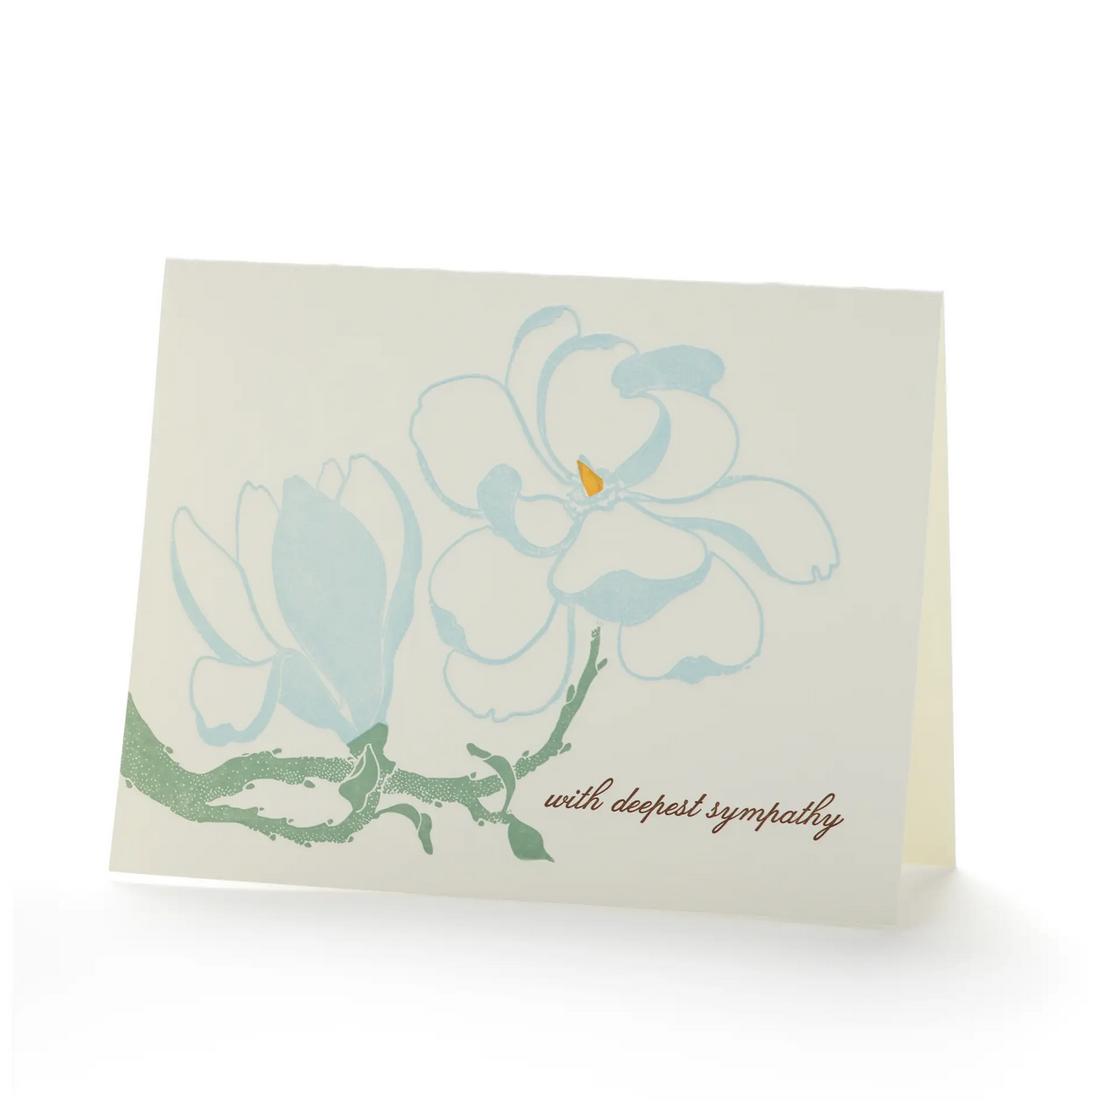 Ilee Papergoods - IP Magnolia Sympathy Card